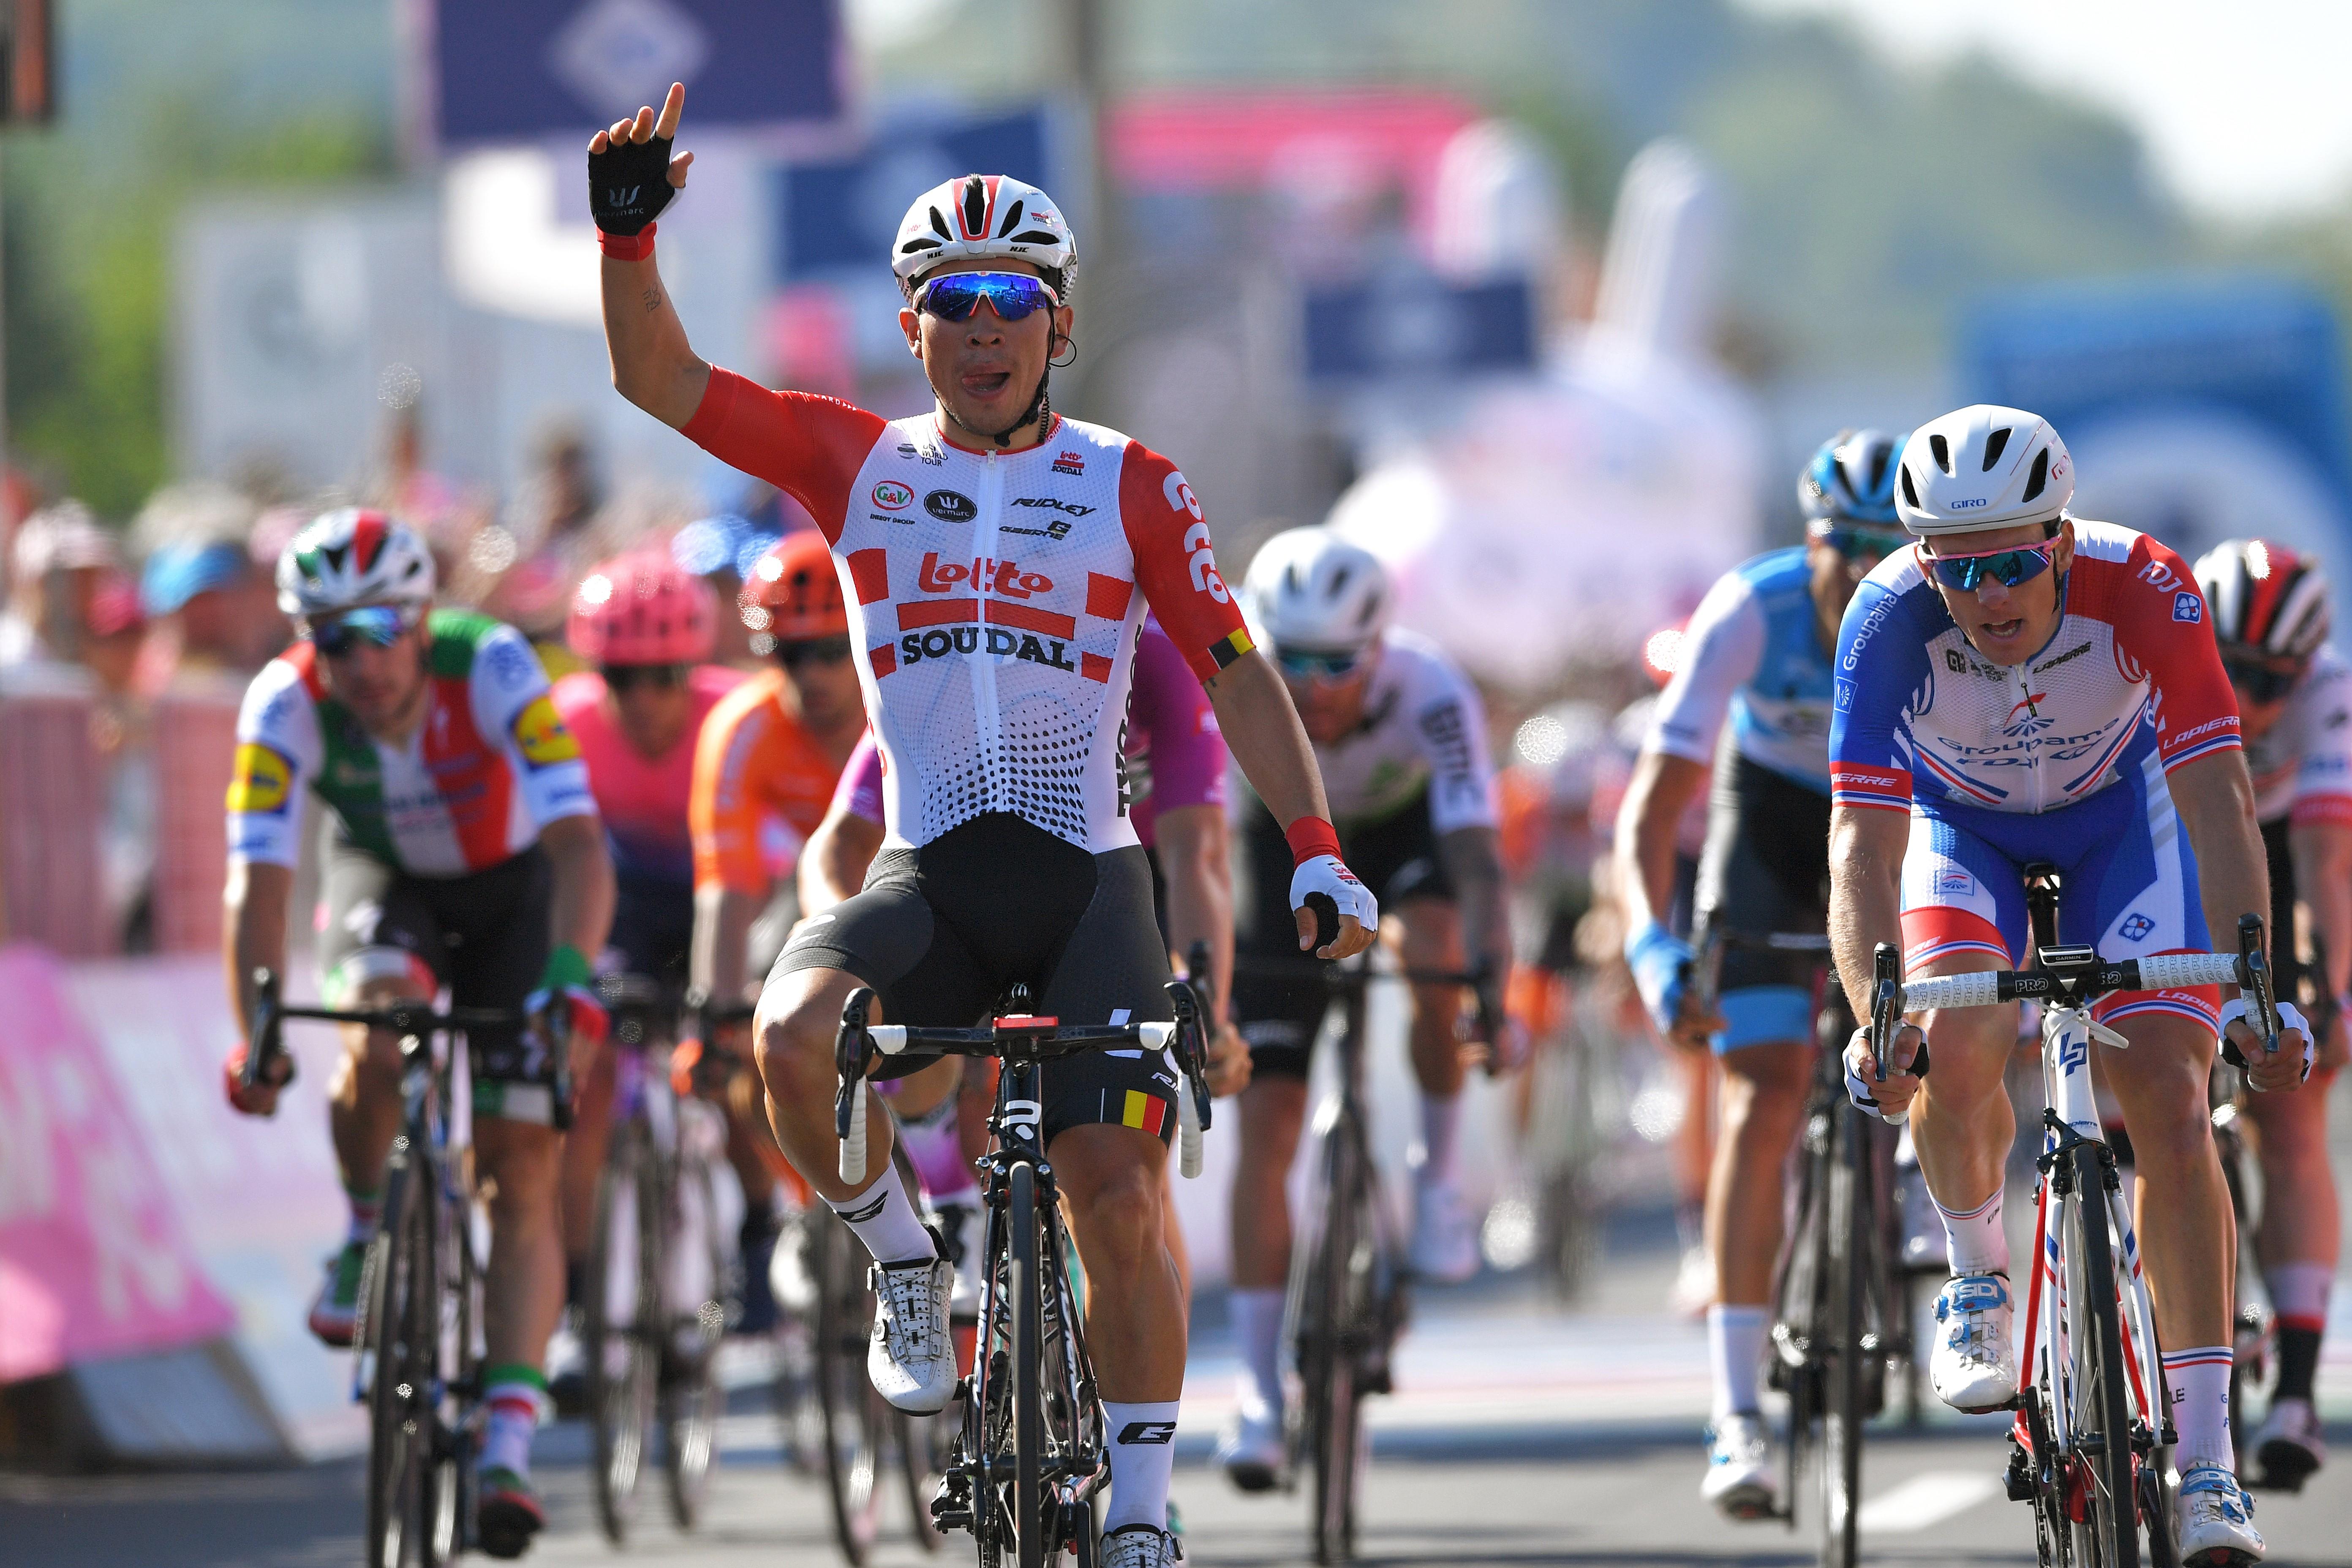 Caleb Ewan célèbre sa victoire lors de la 11e étape du Giro